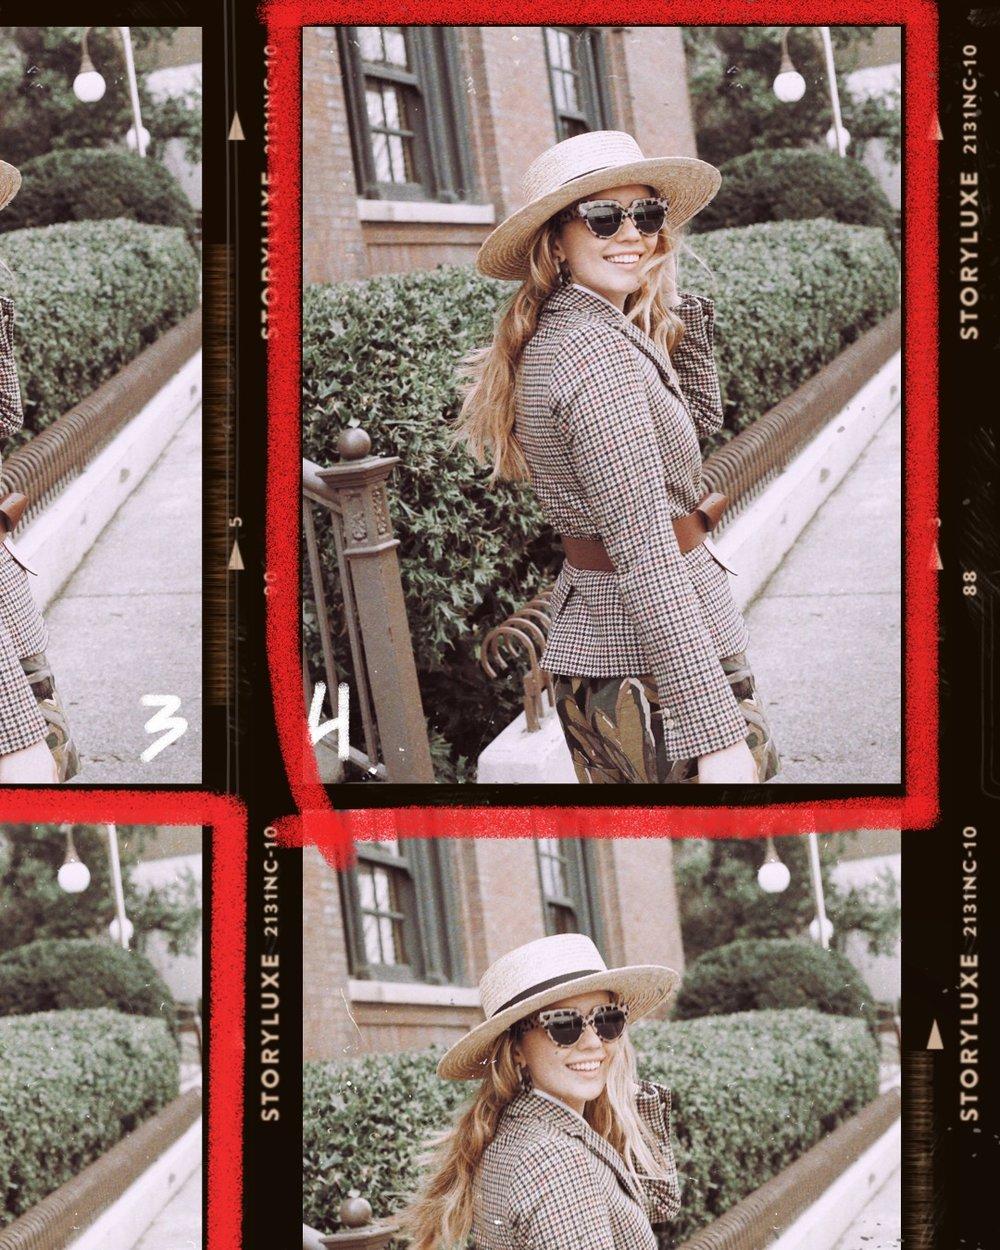 nashville-fashion-bloggers.JPG